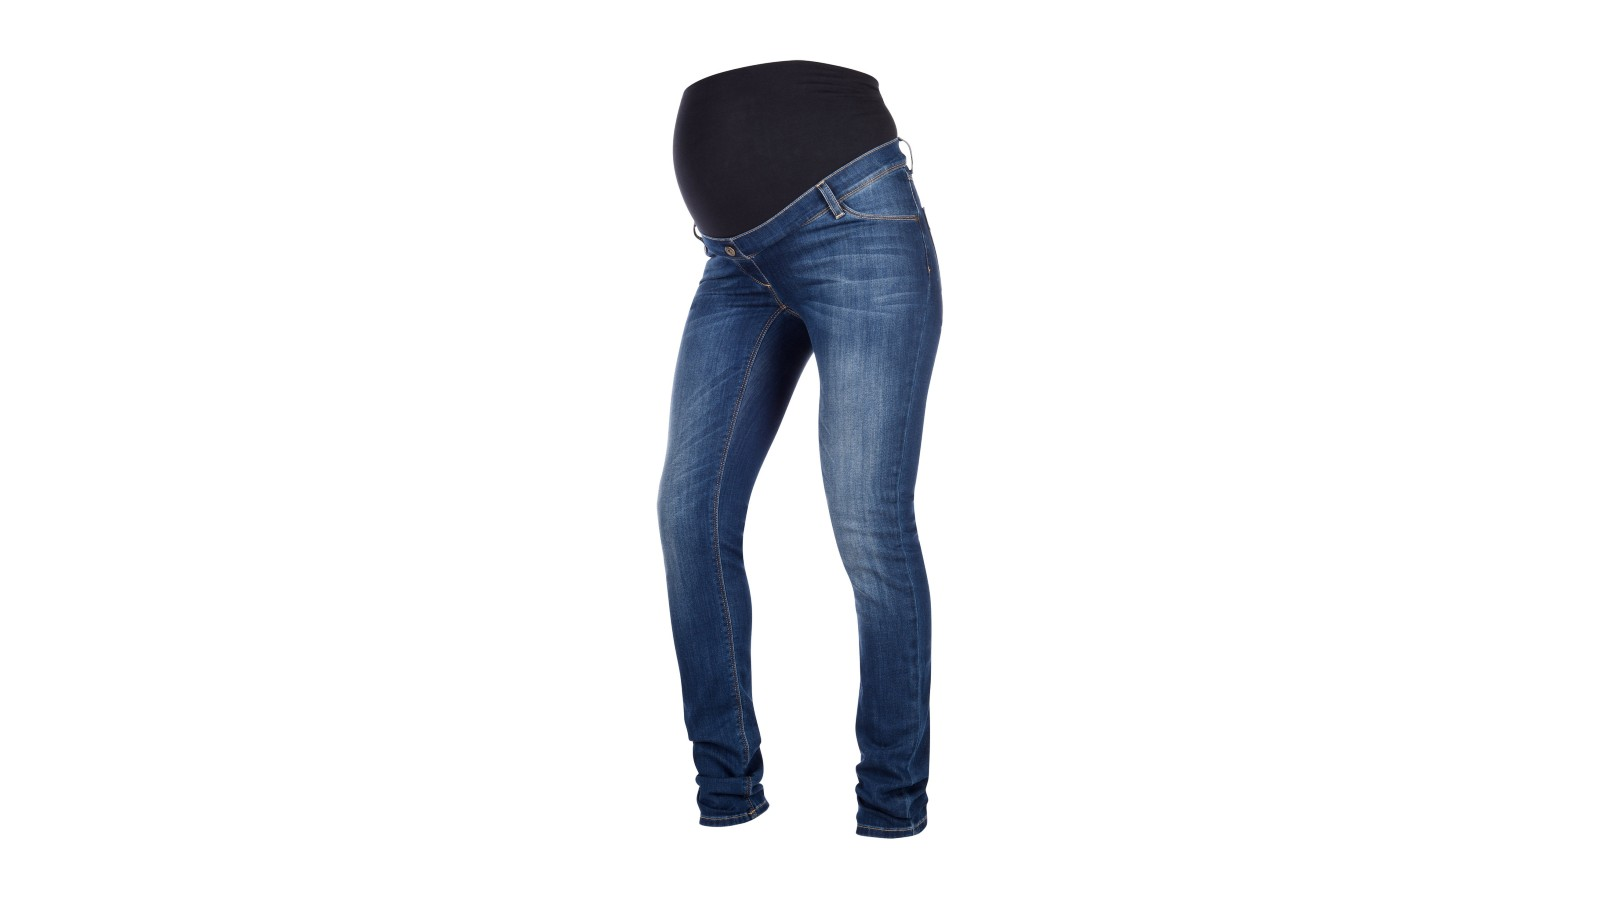 Jeans de maternité Lily &amp ; Ribbon Sophia Stone Wash